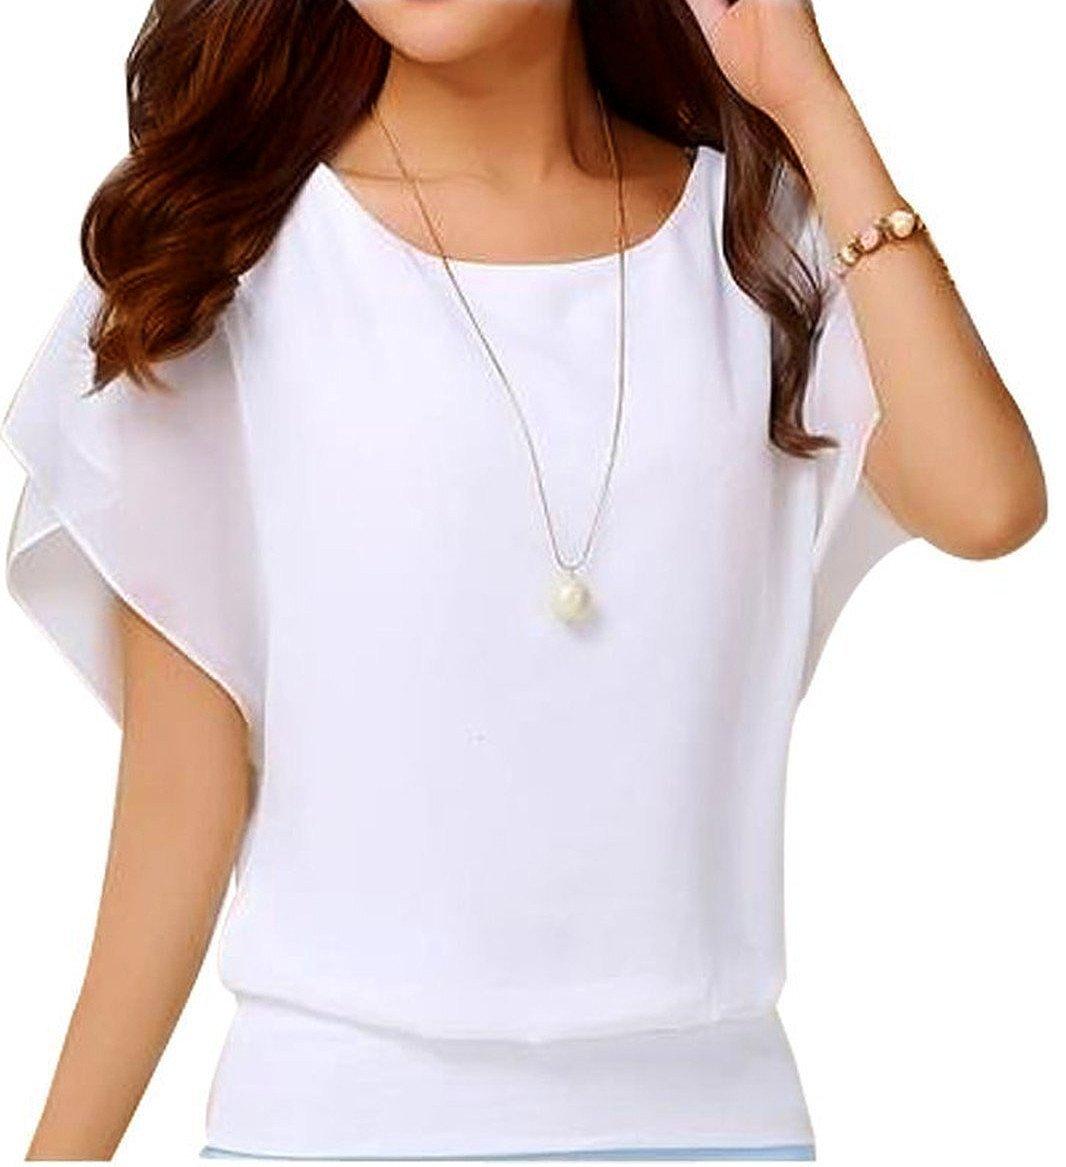 NEINEIWU Ladies Summer Shirt Short Sleeve Batwing Sleeve Round Neck Loose Chiffon Blouse Tops (White M)